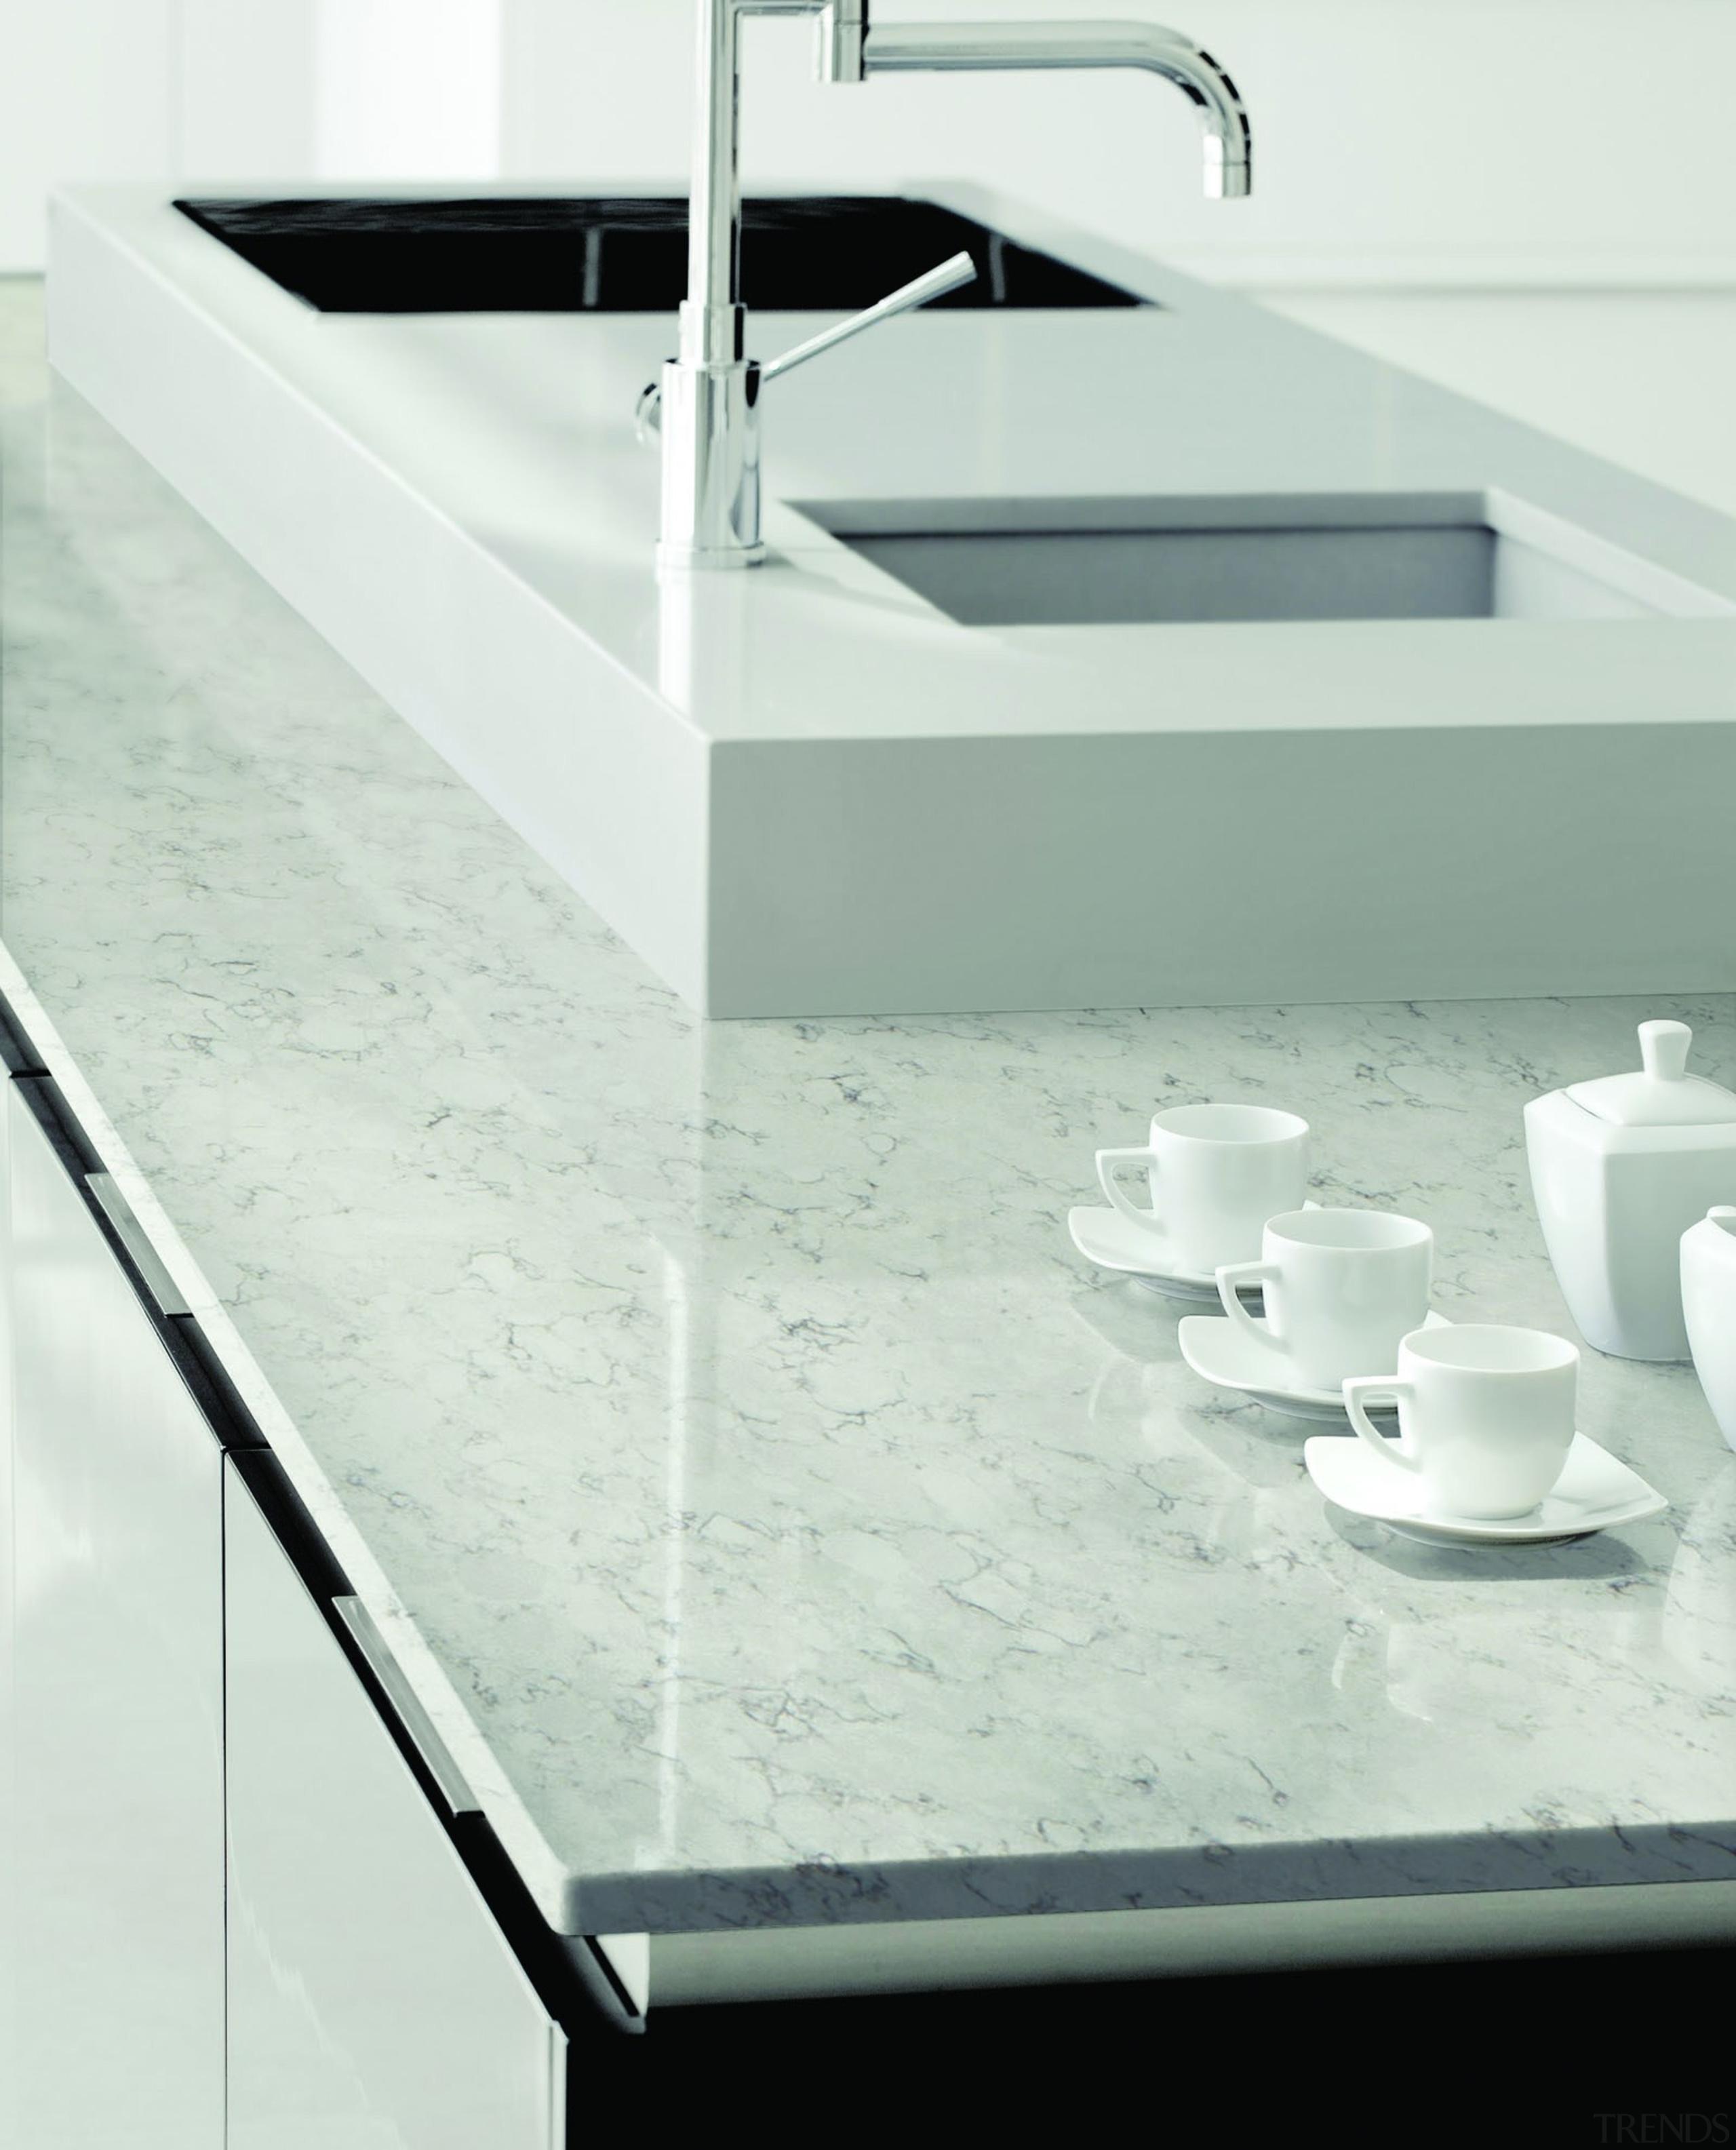 Blanco Orion - SV Cosentino Latina 026 B bathroom sink, countertop, floor, product design, sink, tap, white